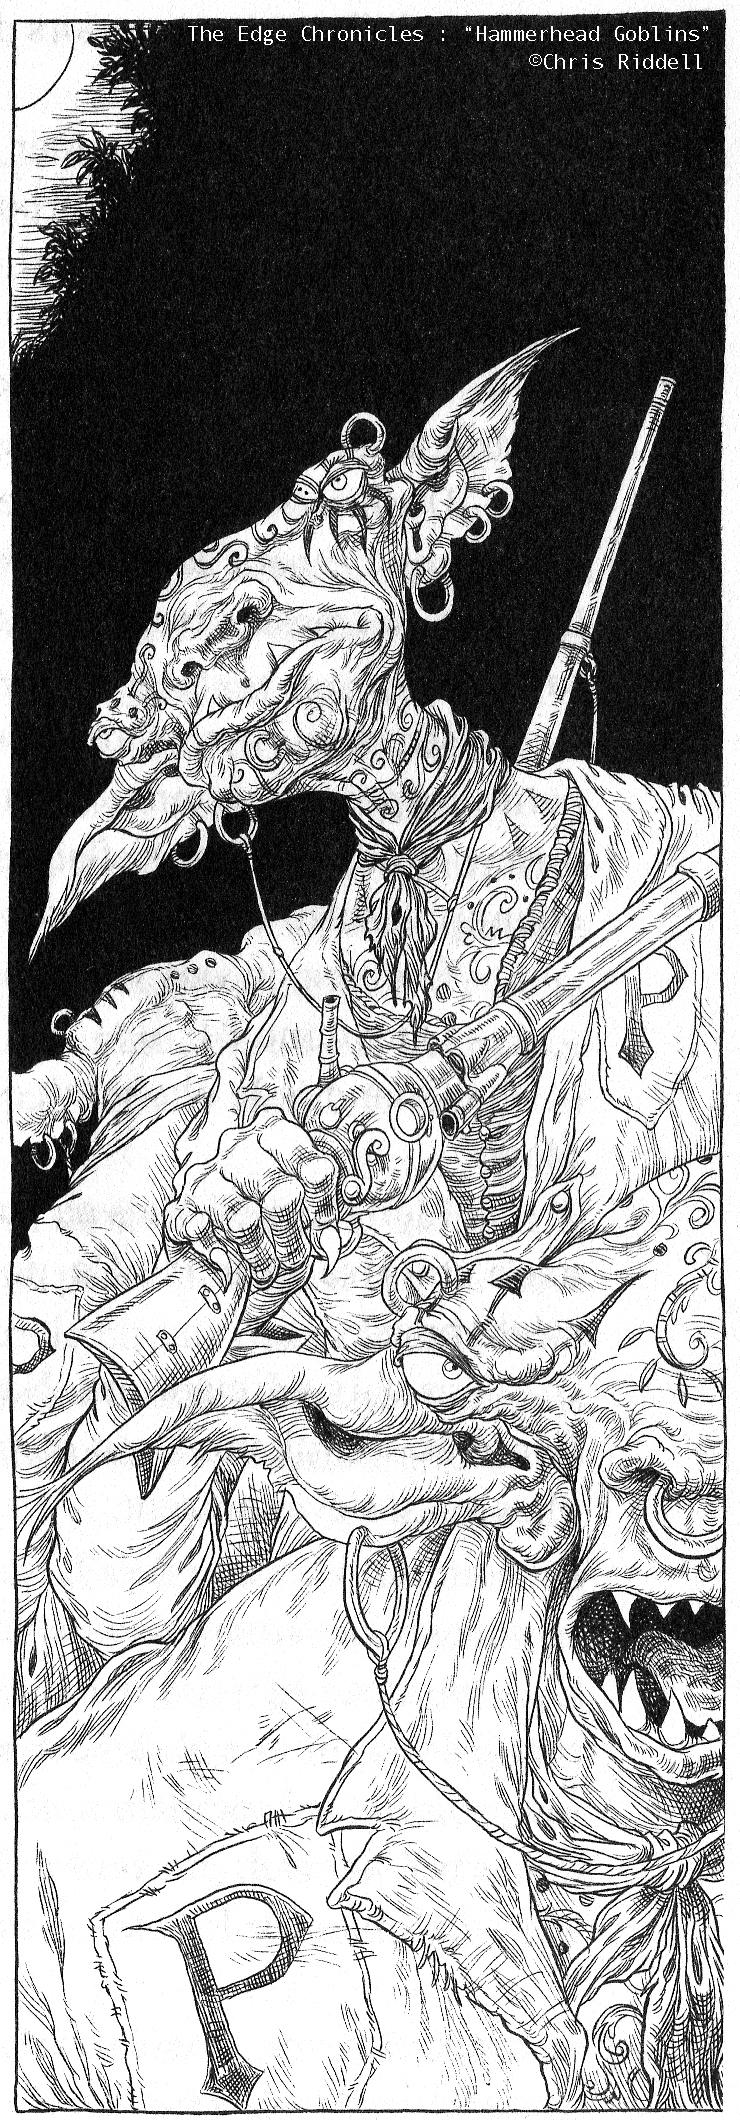 Goblins (The Edge Chronicles)